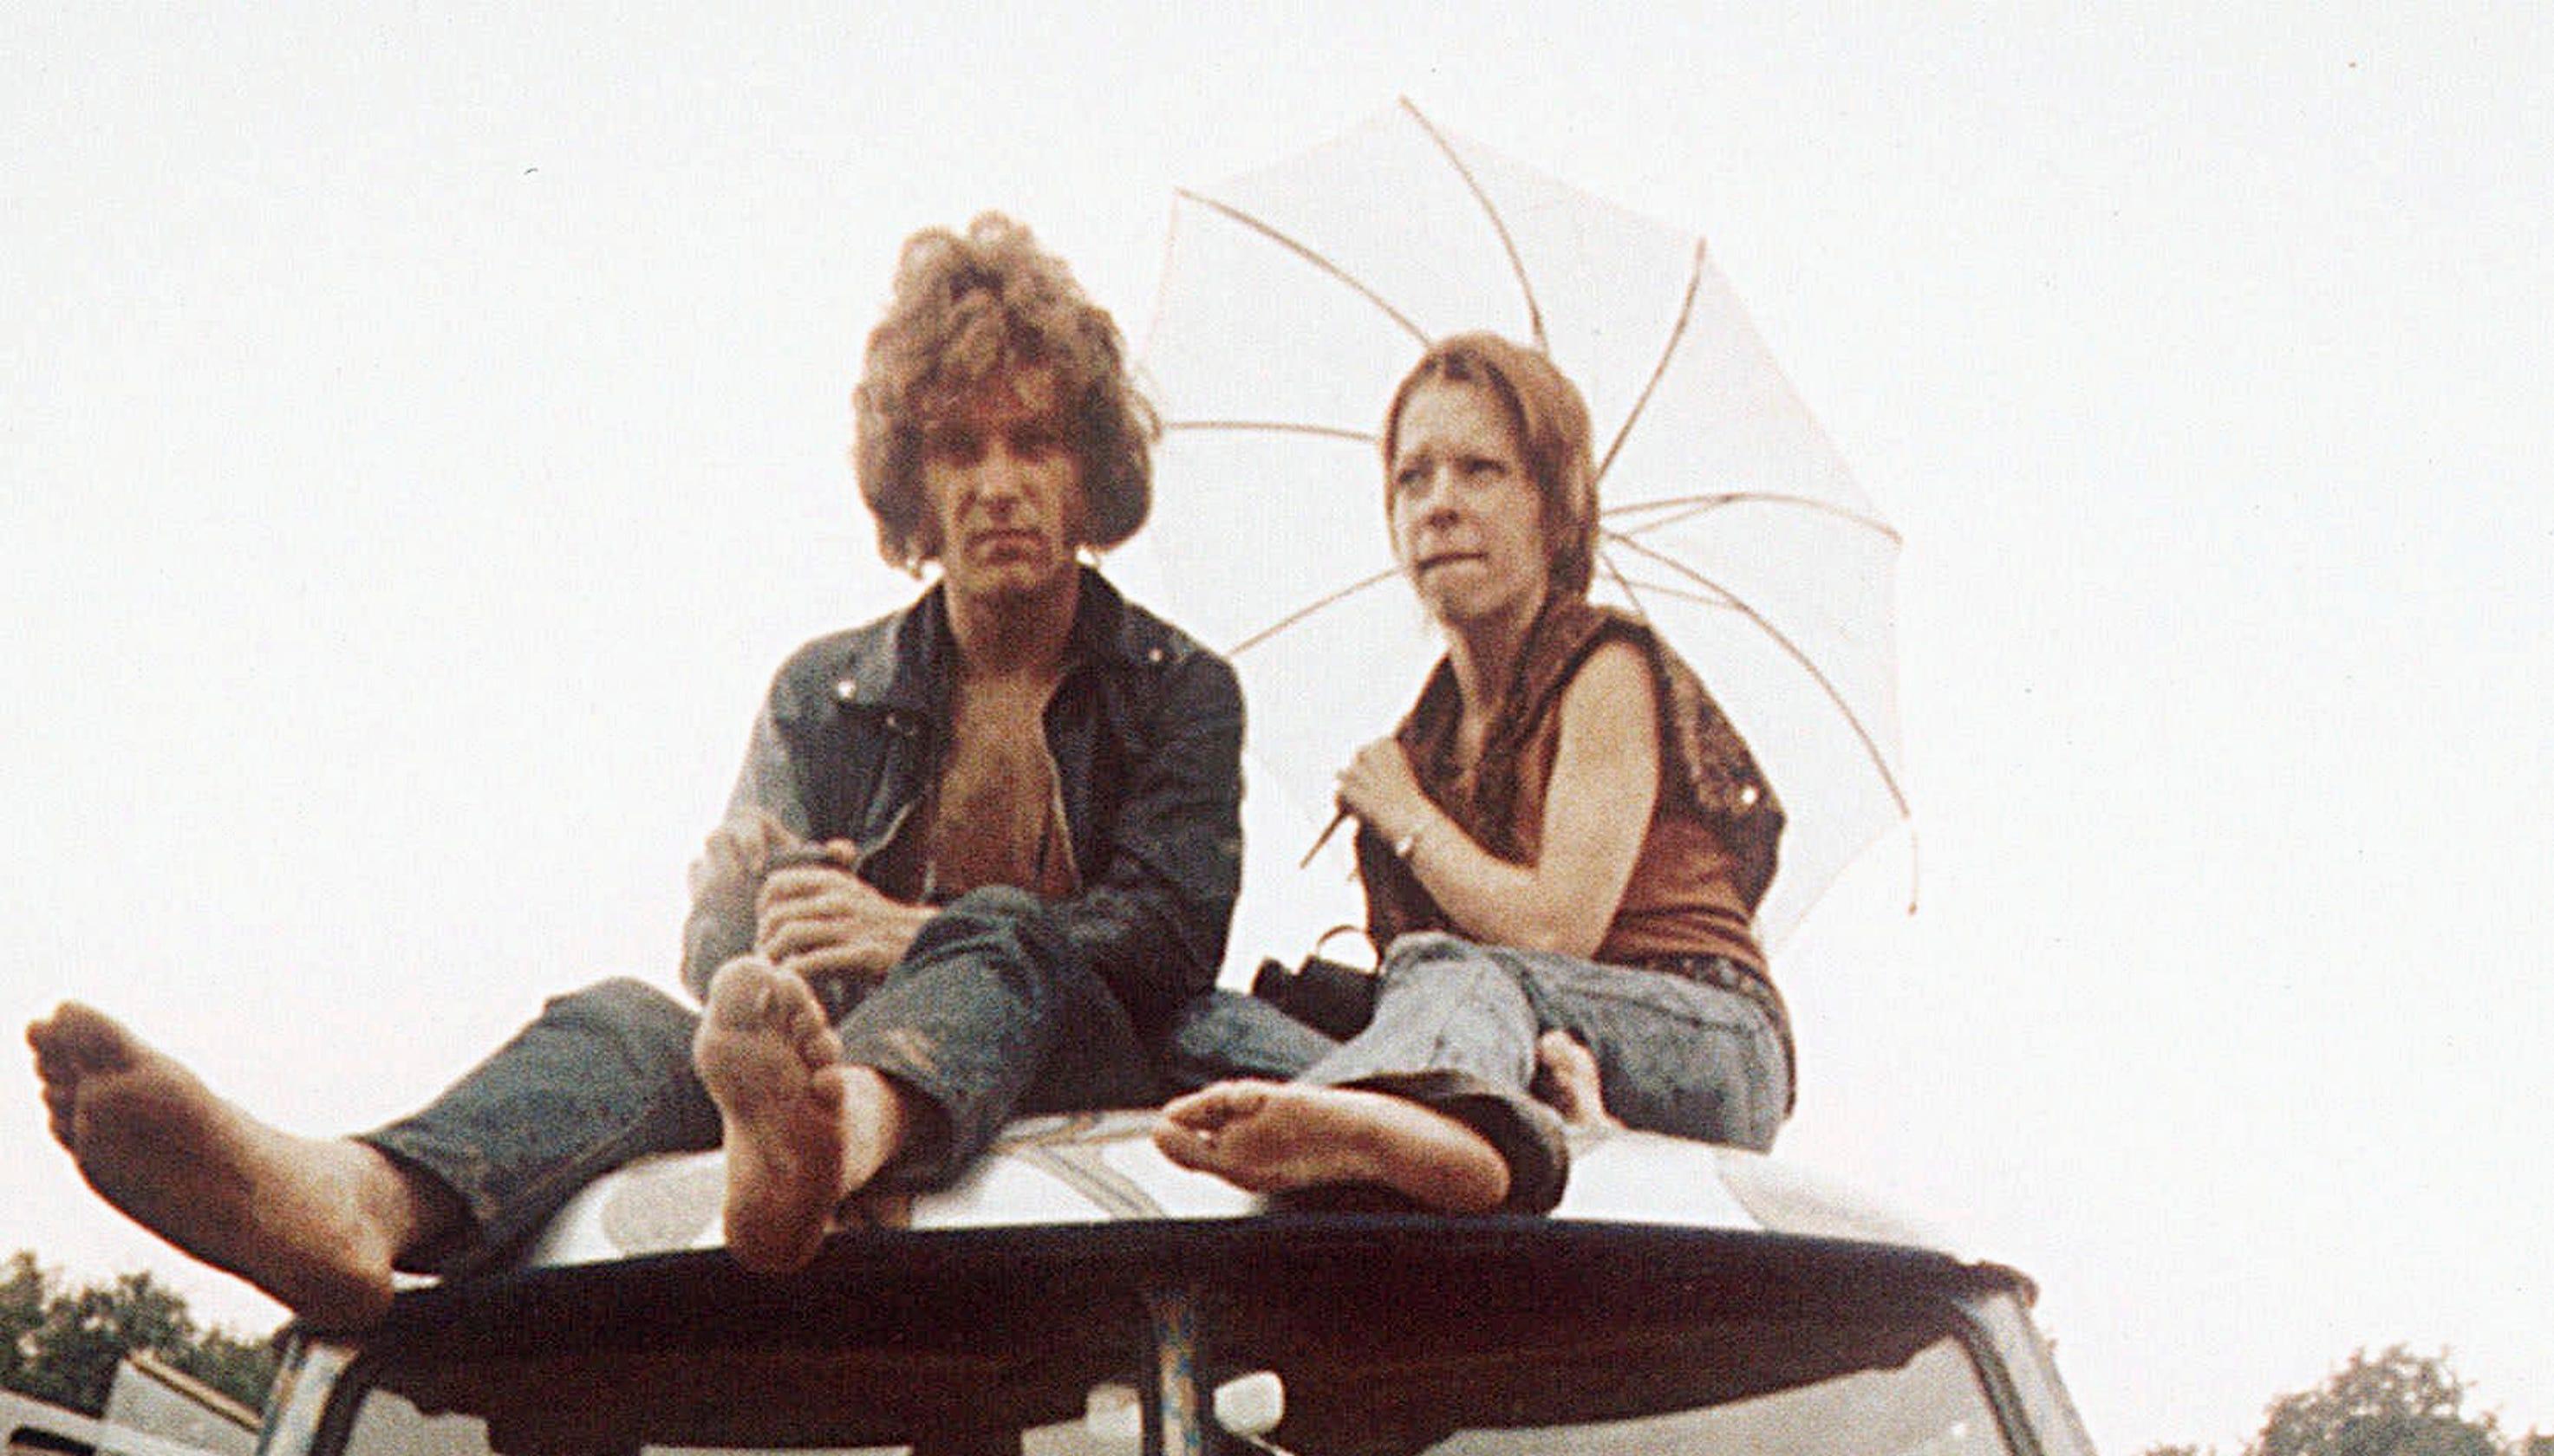 Things to do next week: Celebrate 50 years of Woodstock